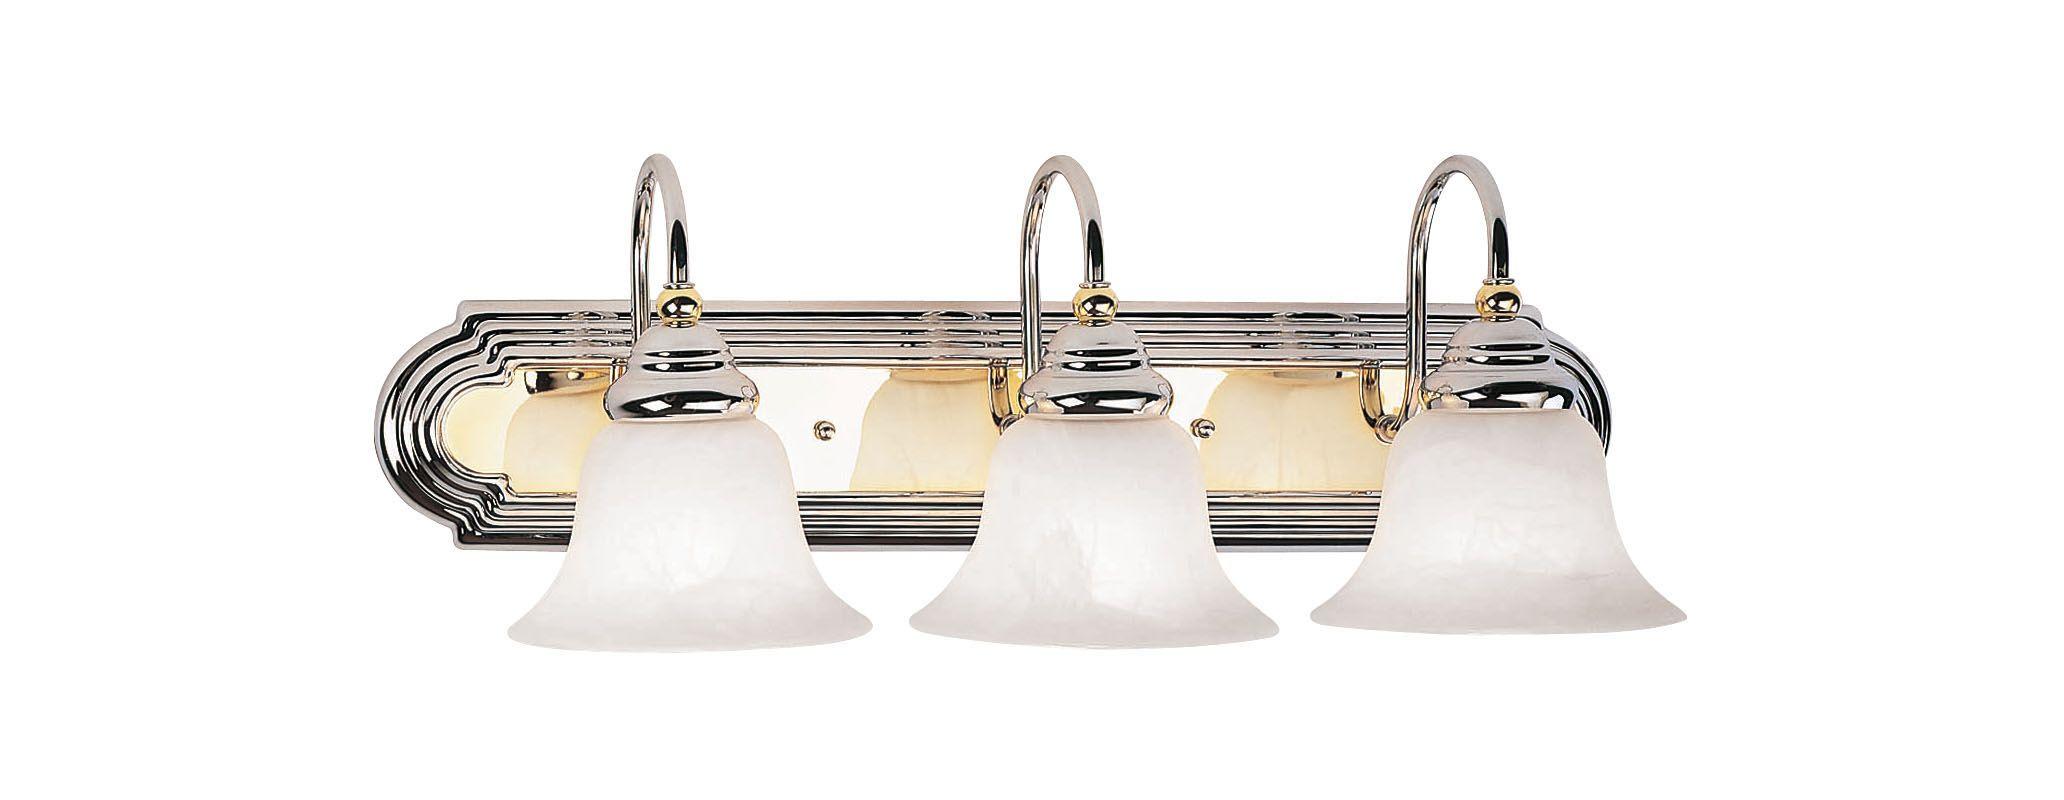 Livex Lighting 1003 Belmont 3 Light Vanity Light Chrome/Polished Brass